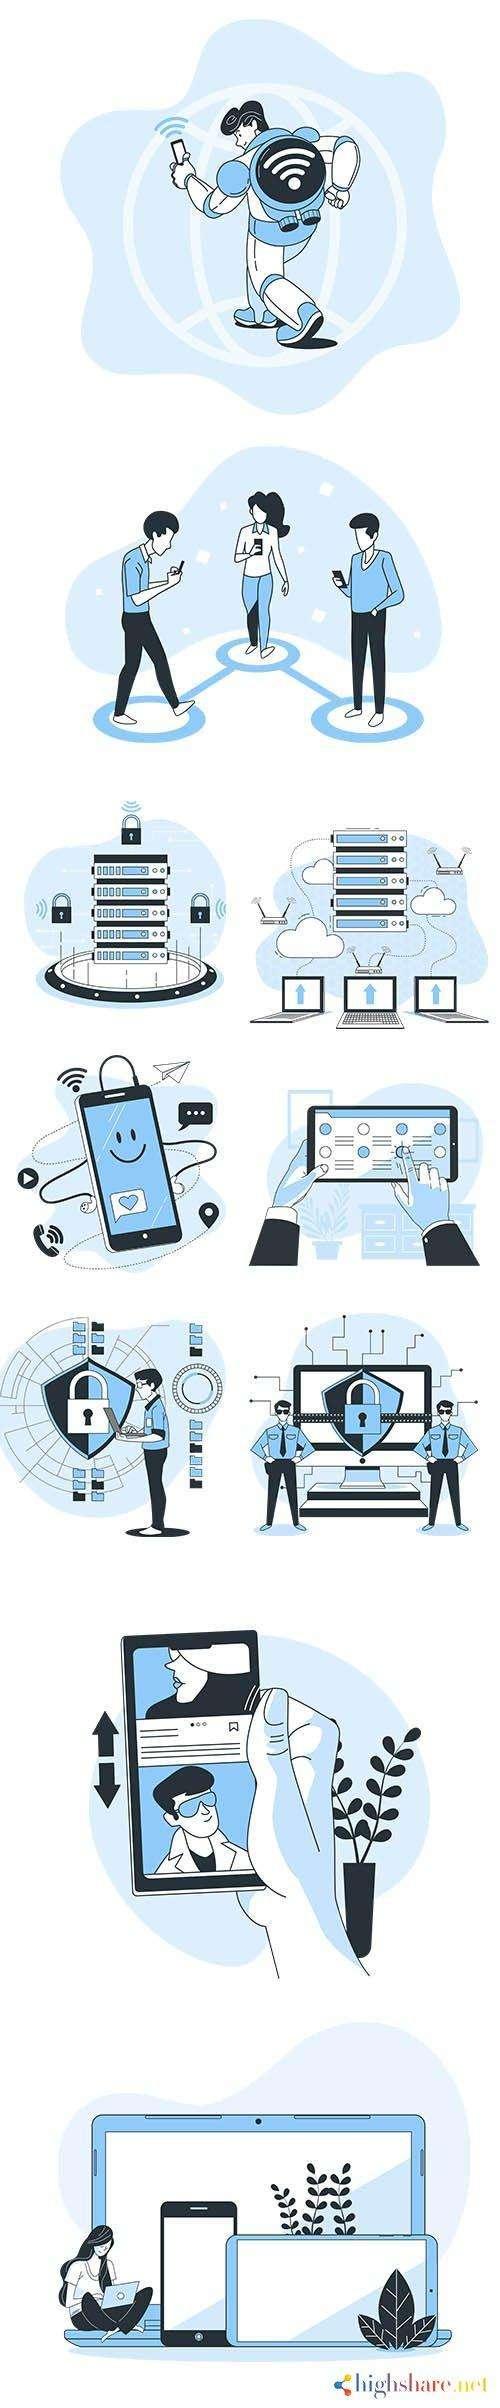 vector illustrations technology concept vol 2 5f42824136831 - Vector Illustrations Technology Concept Vol 2